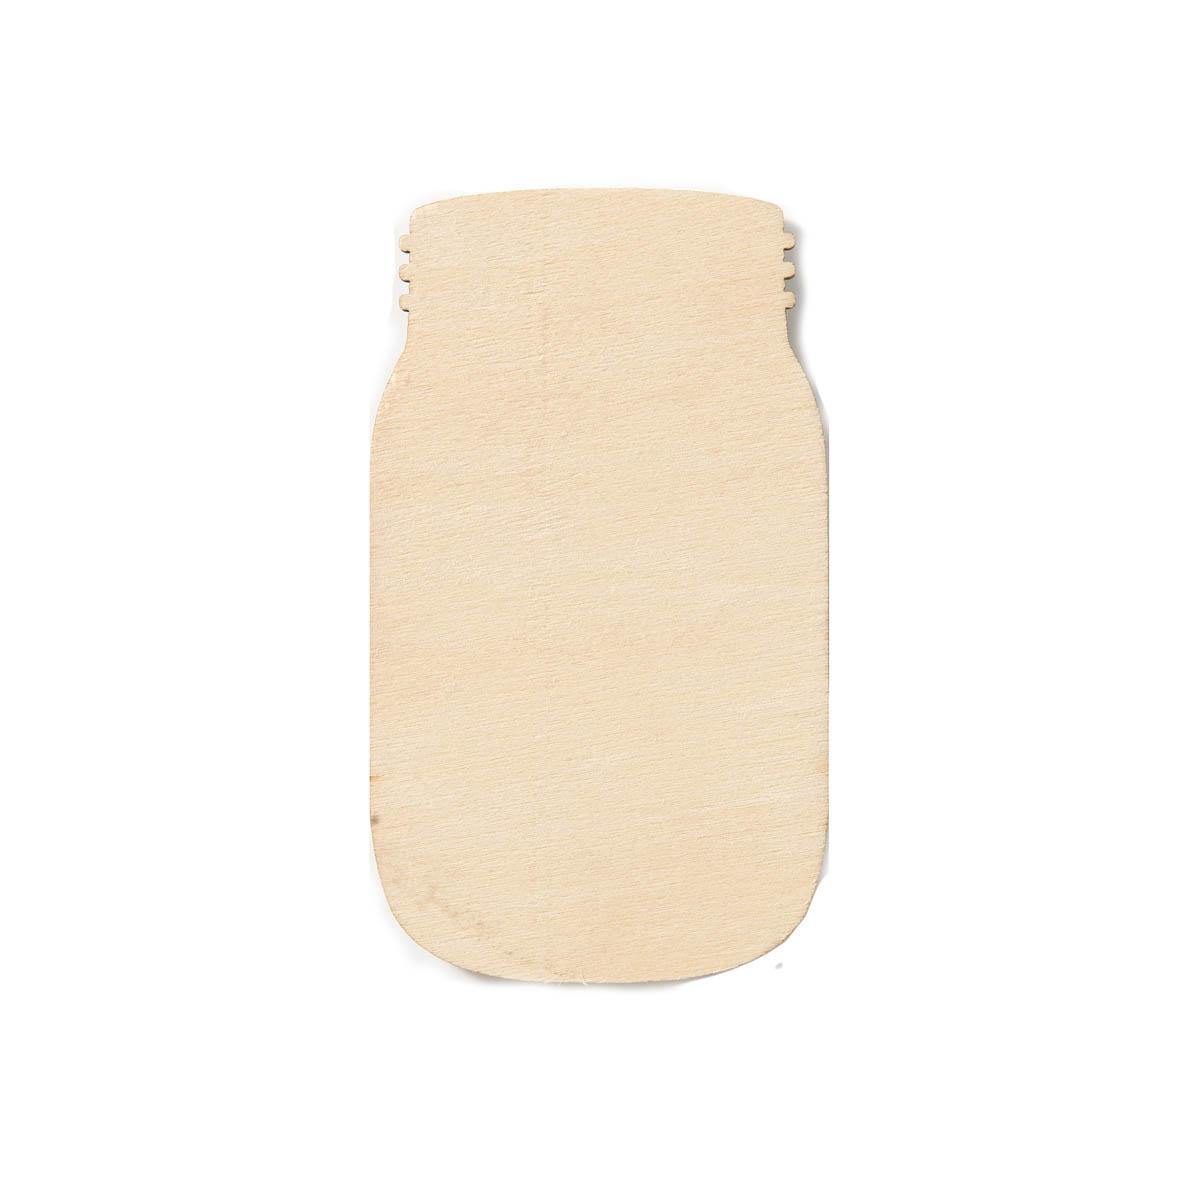 Plaid ® Wood Surfaces - Unpainted Shapes - Jar - 98952